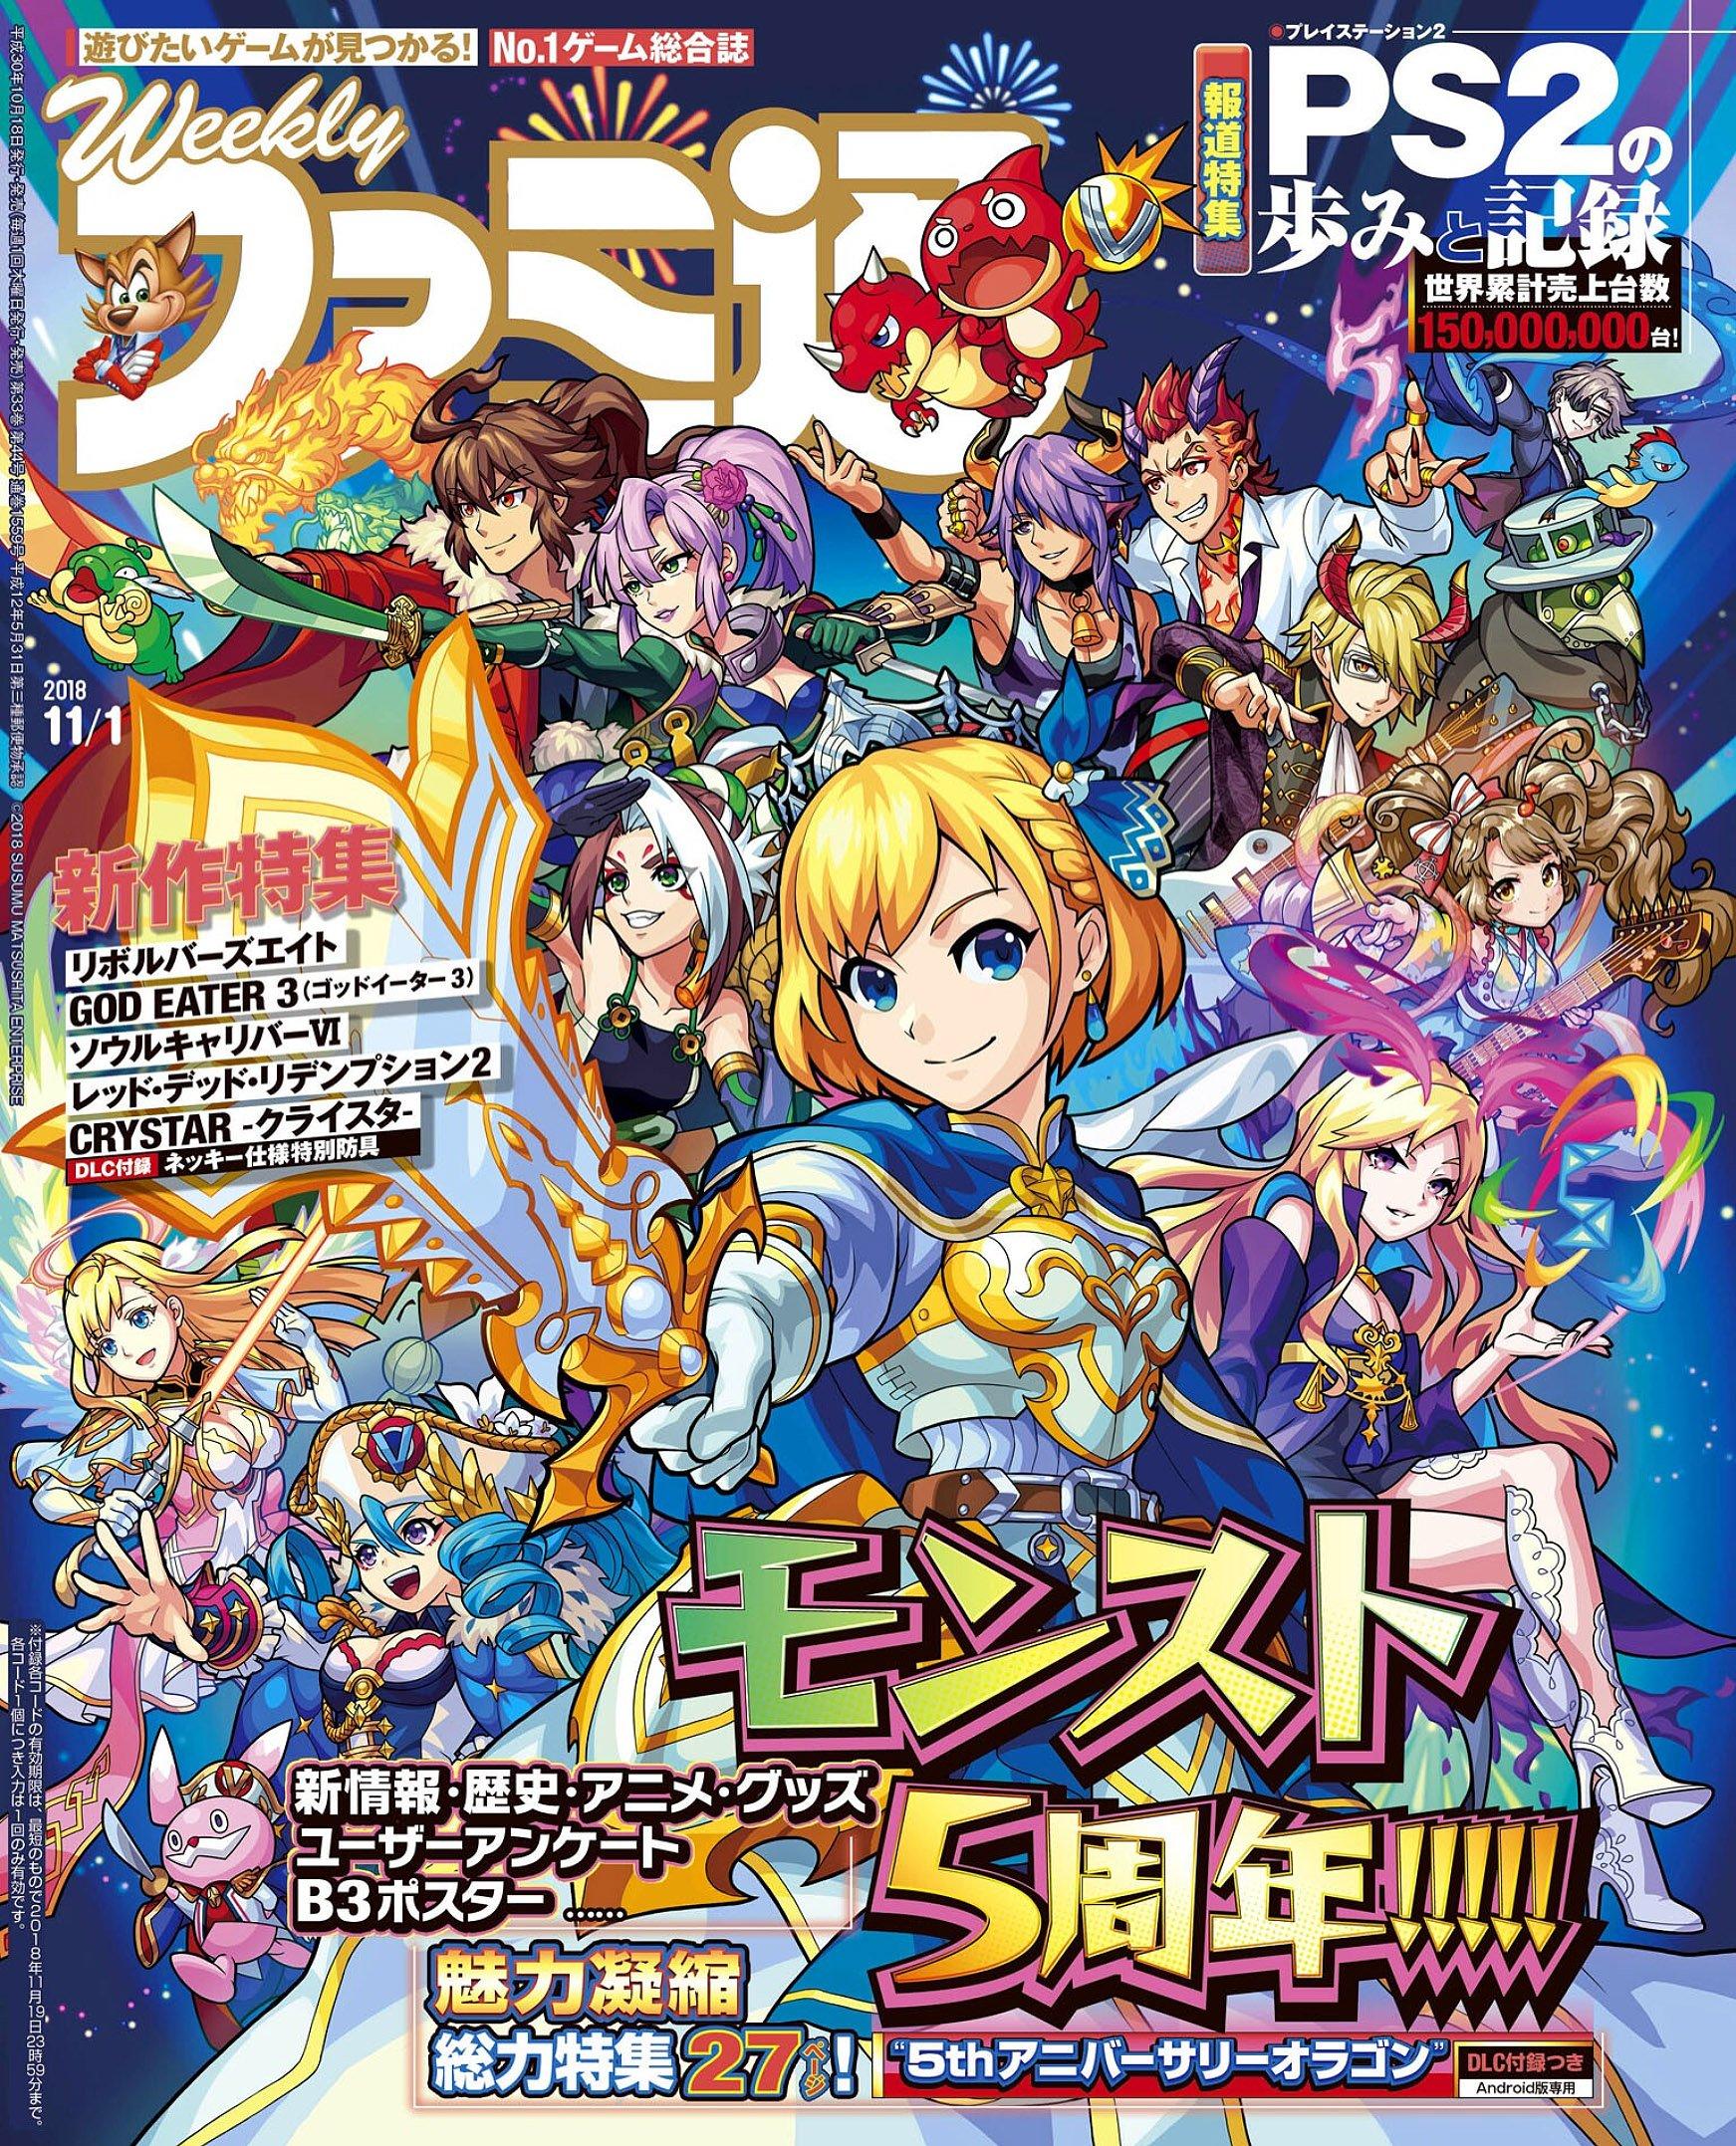 Famitsu 1559 (November 1, 2018)